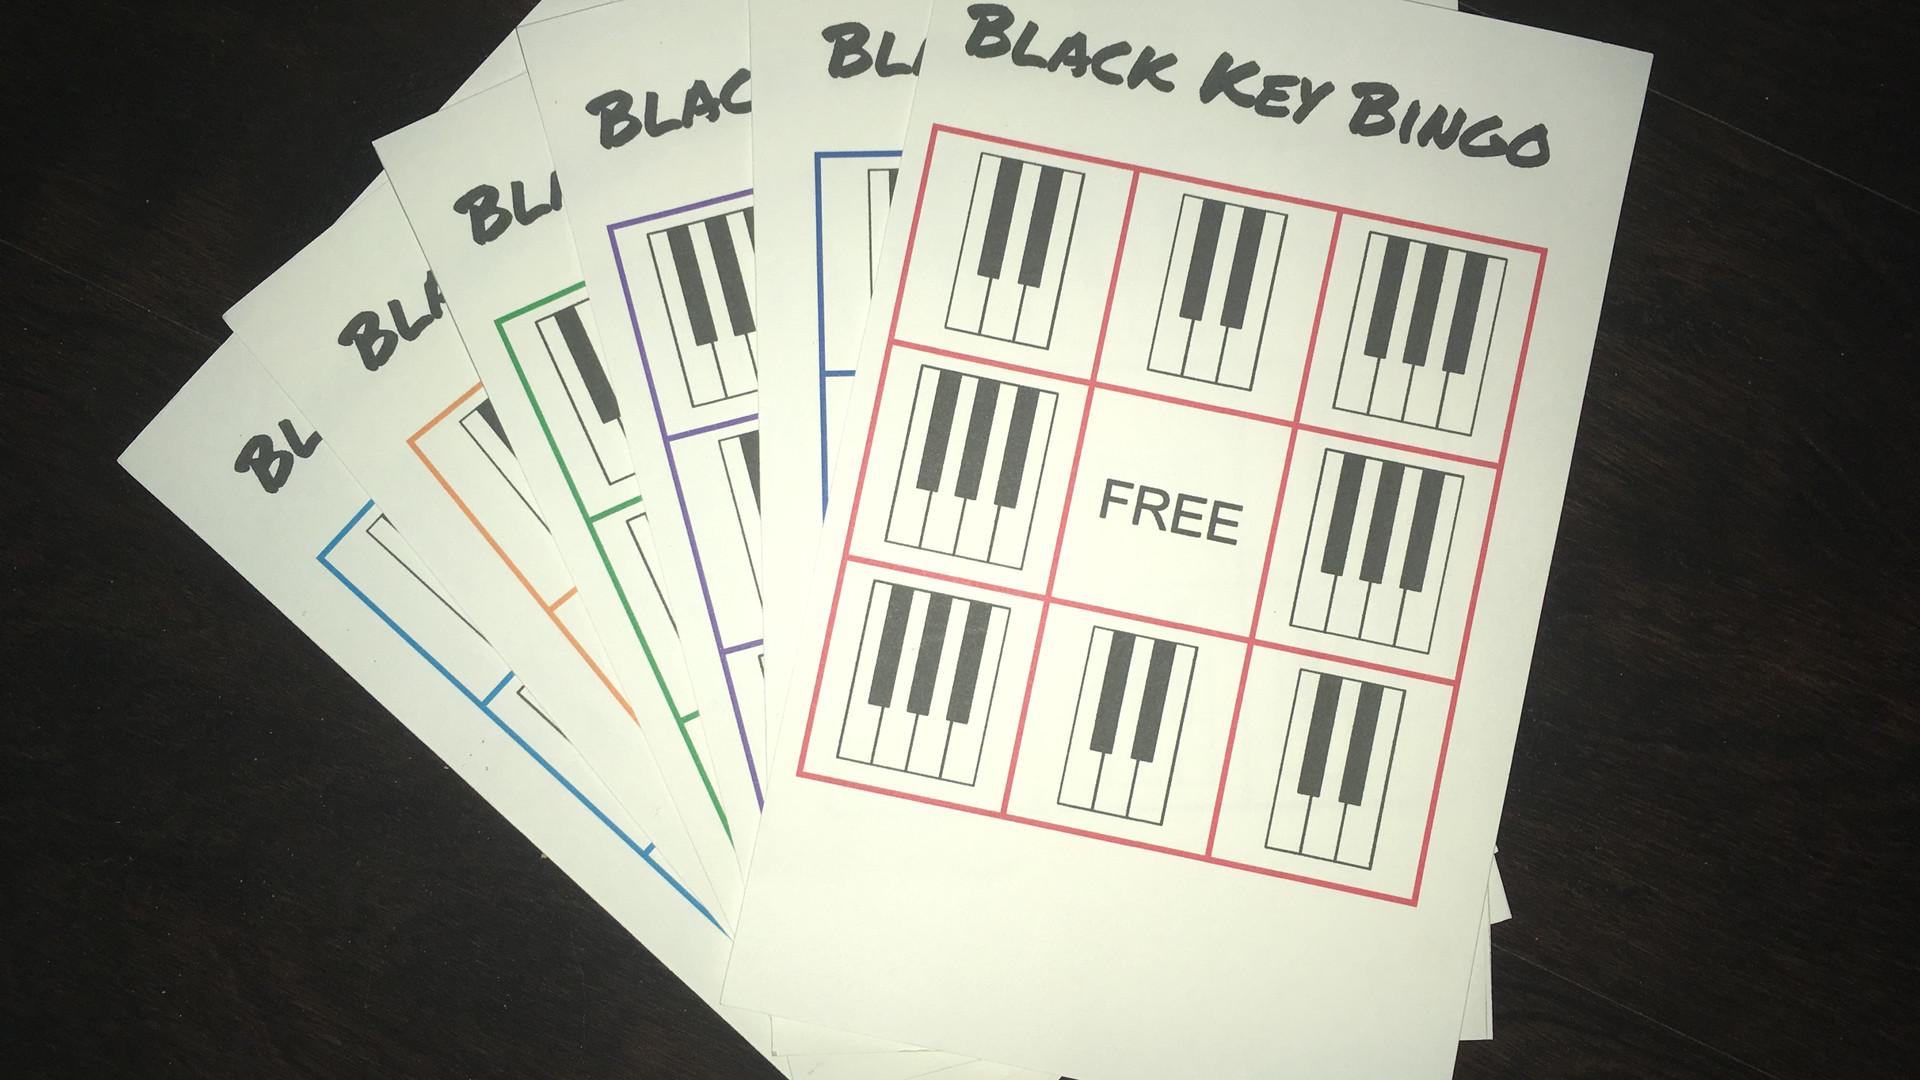 Black Key Bingo